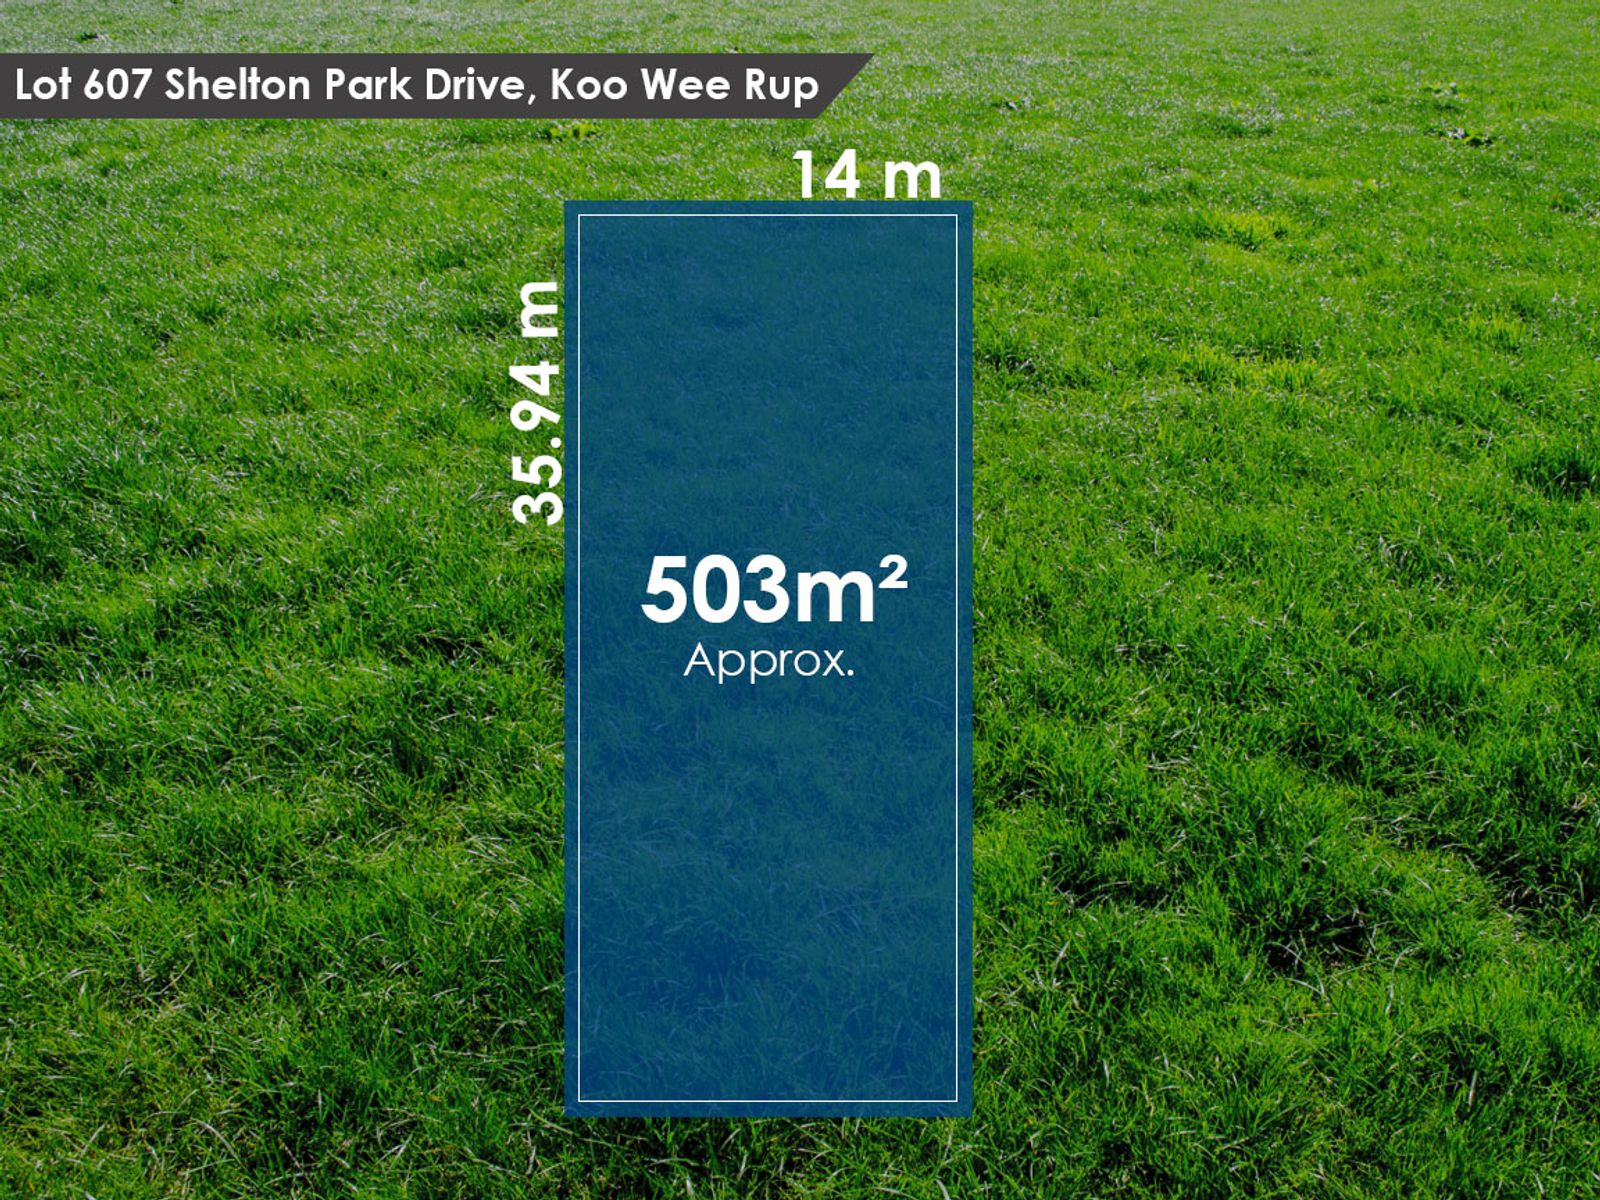 Lot 607 Shelton Park Drive, Koo Wee Rup, VIC 3981